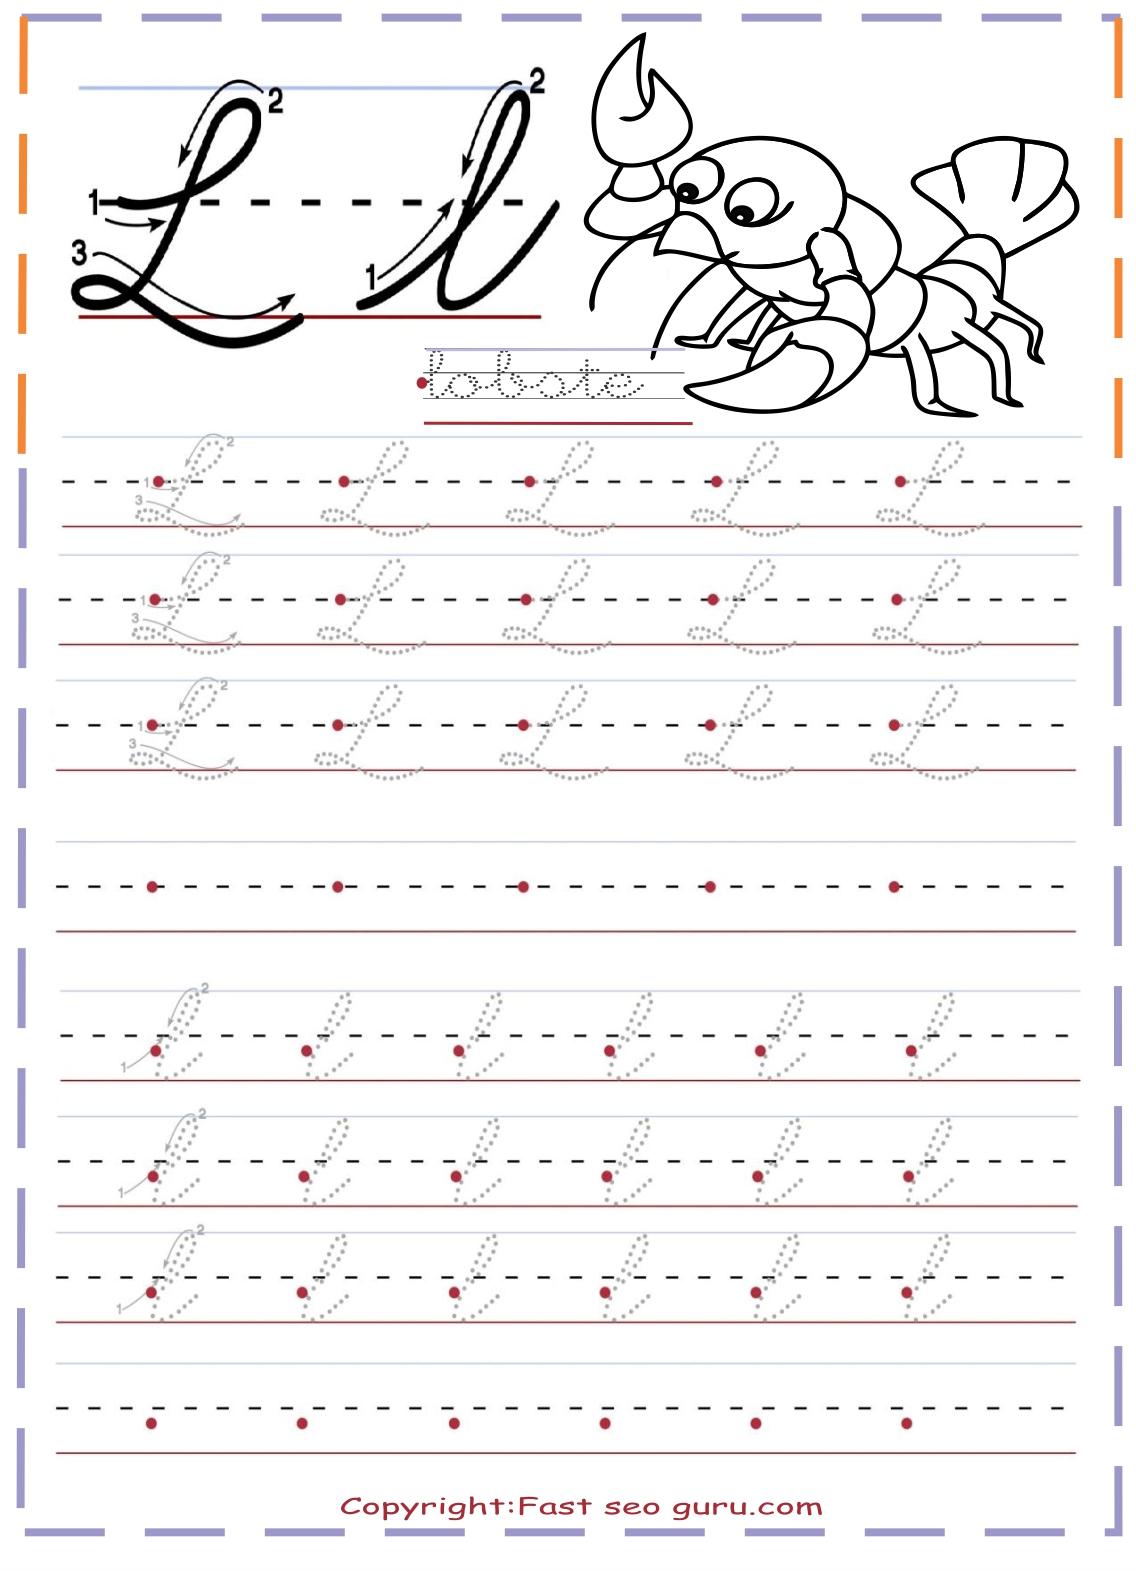 Cursive Handwriting Practice Tracing Worksheets Letter L